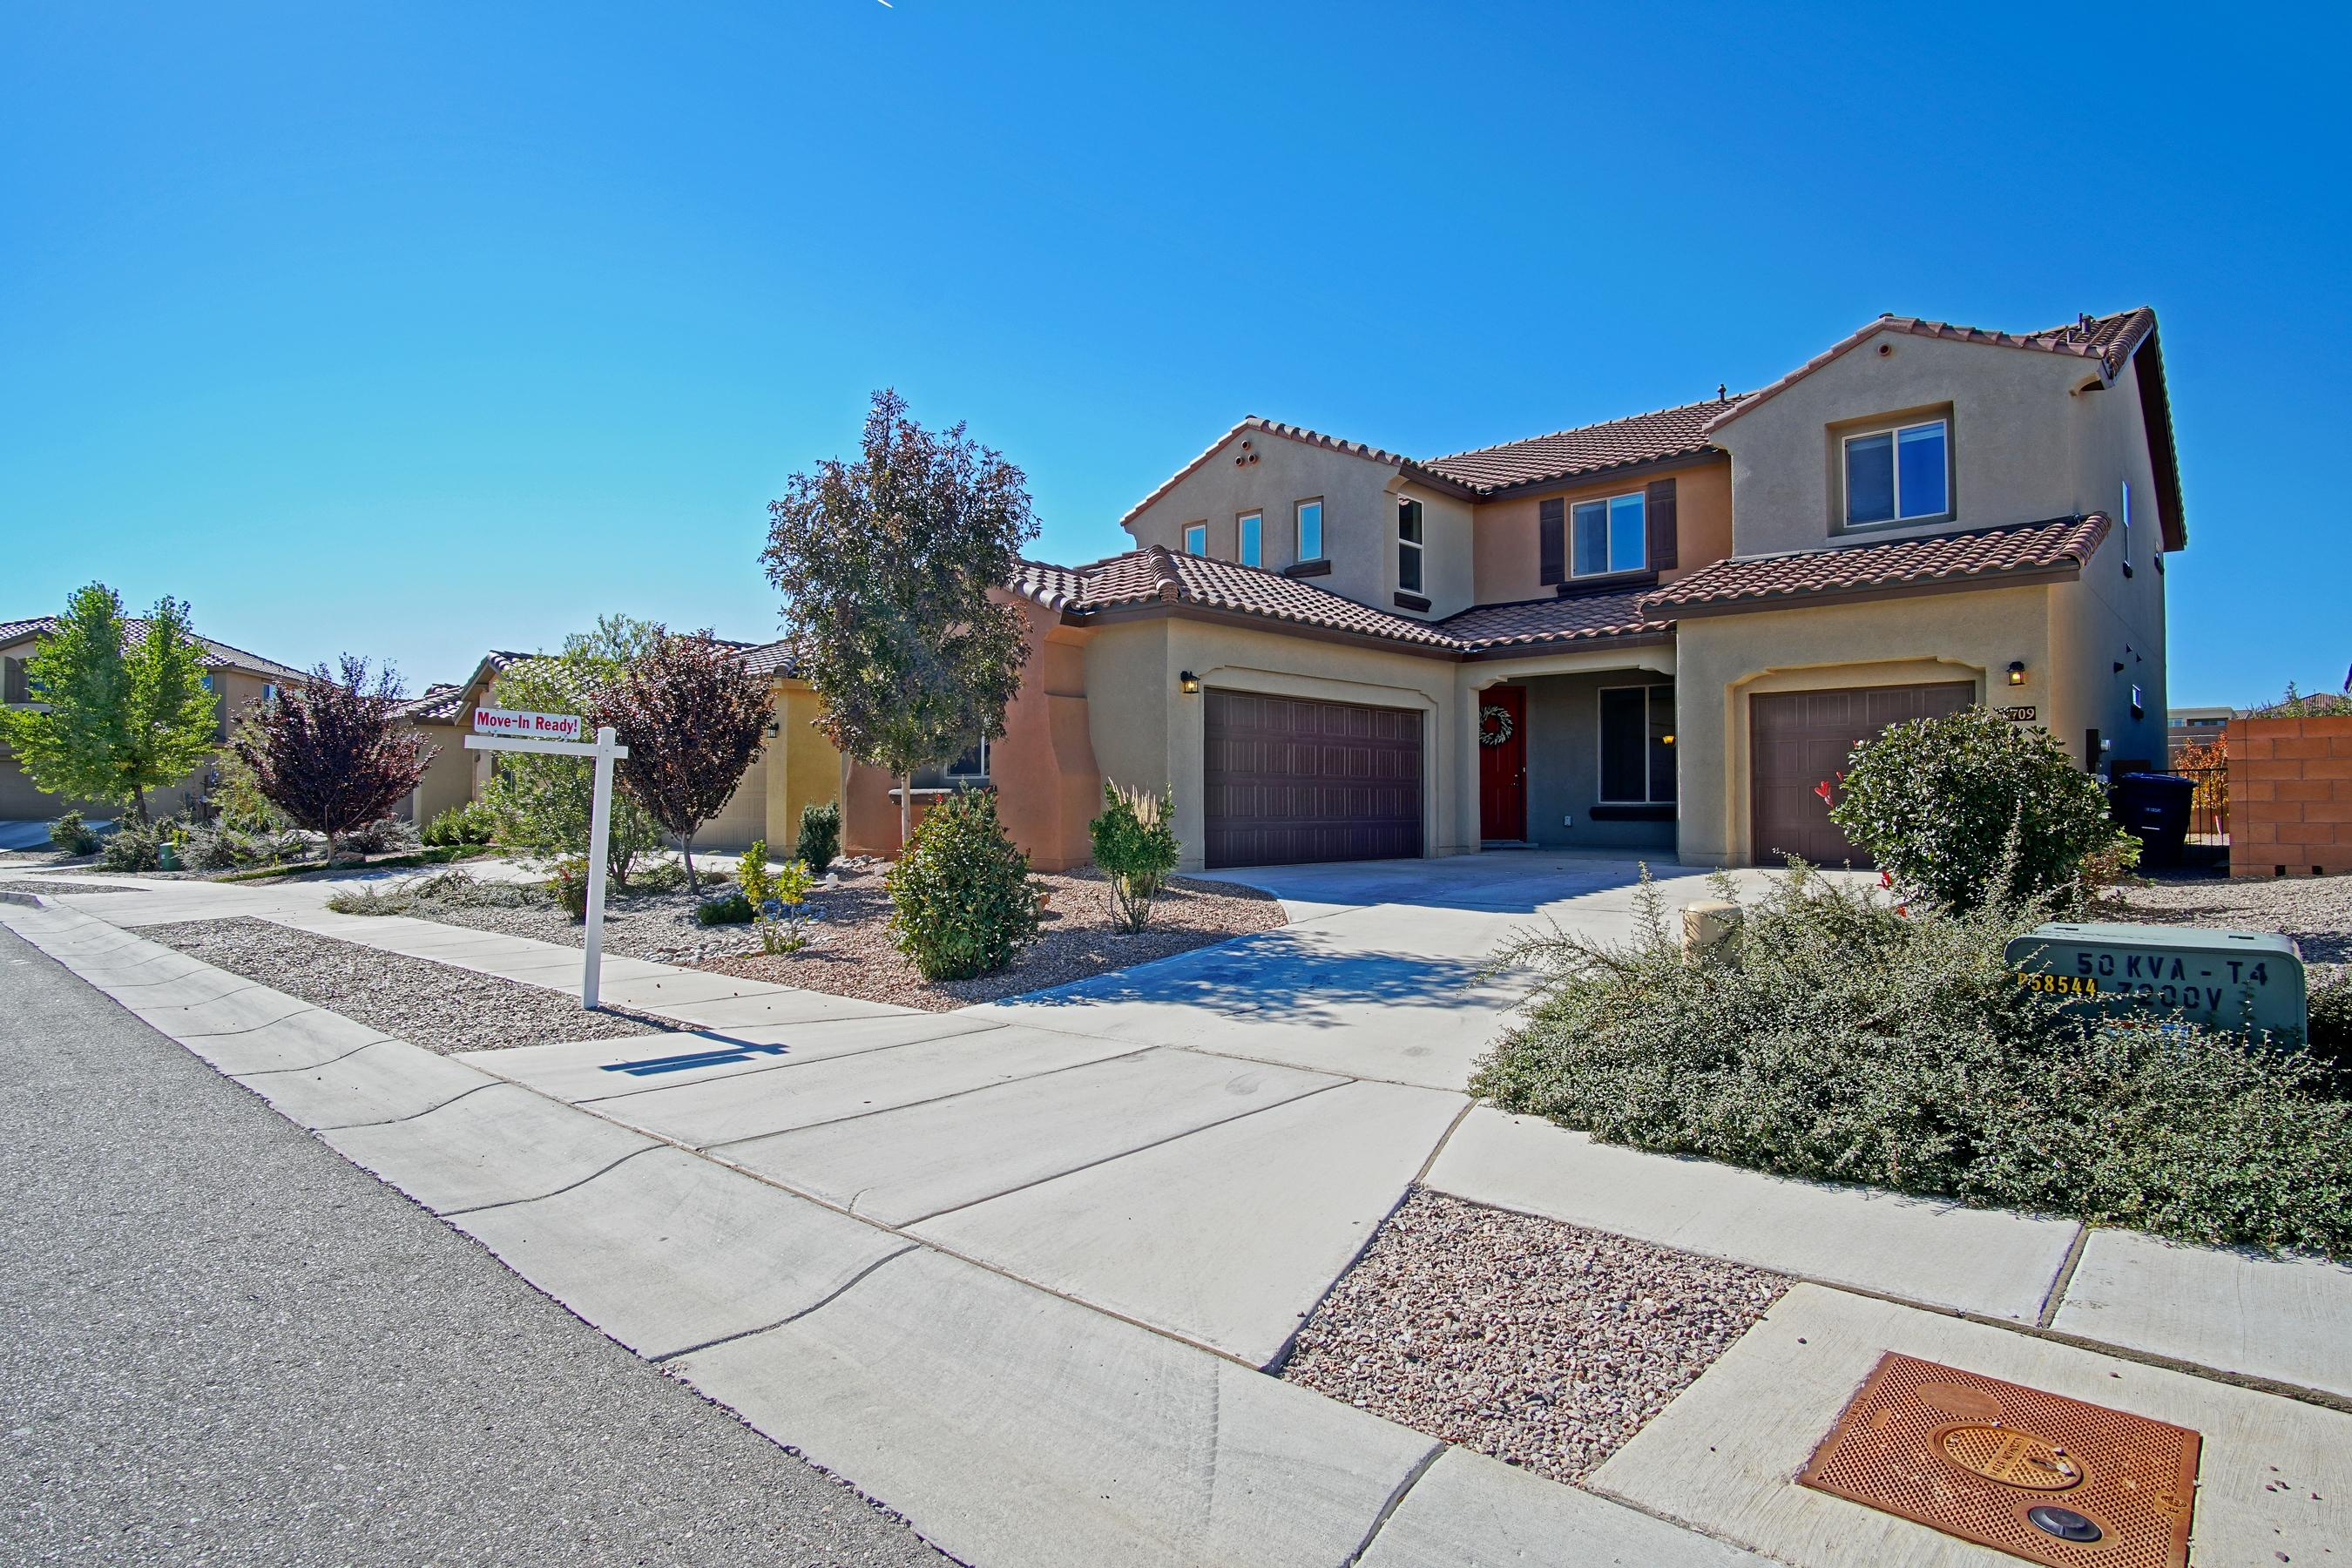 6709 NW Nueva Piedra Street, Northwest Albuquerque and Northwest Heights, New Mexico